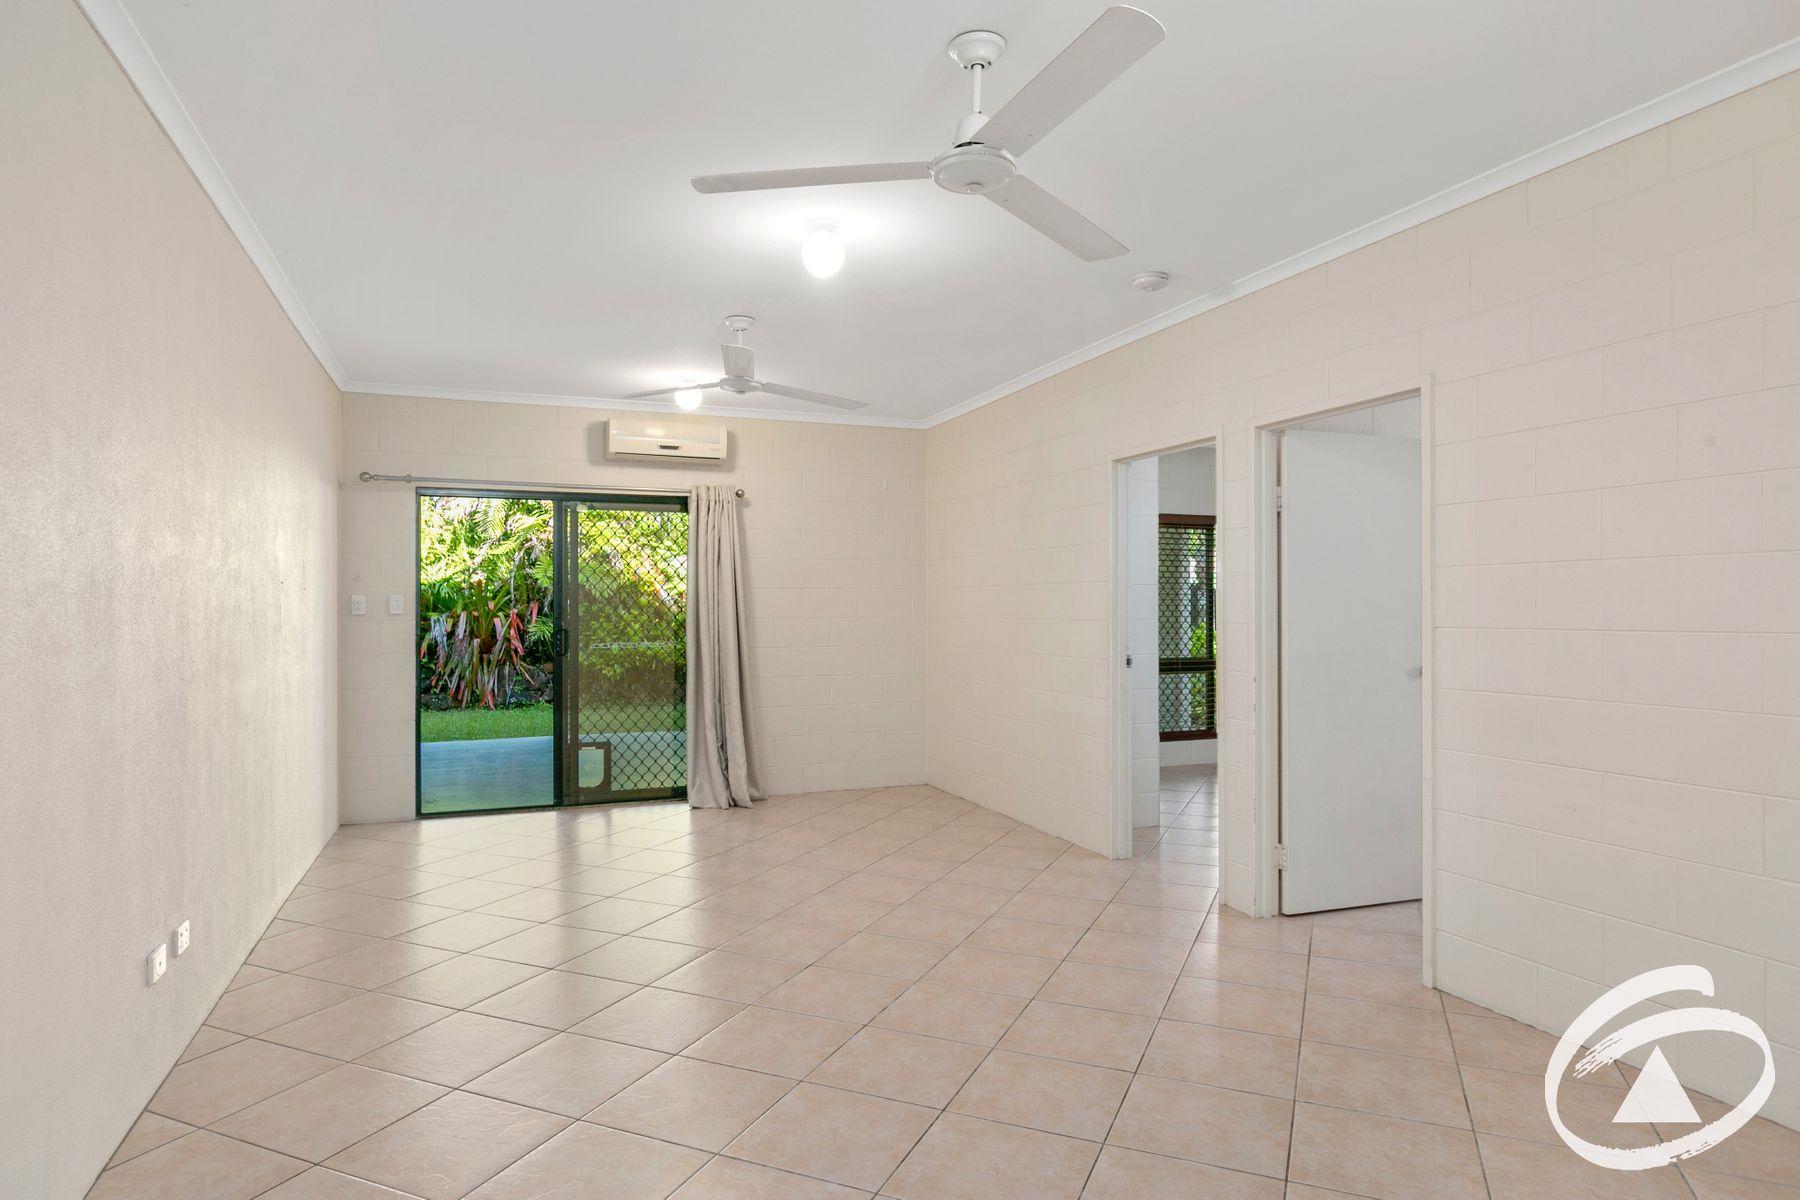 37 Pilosa Street, Redlynch, QLD 4870